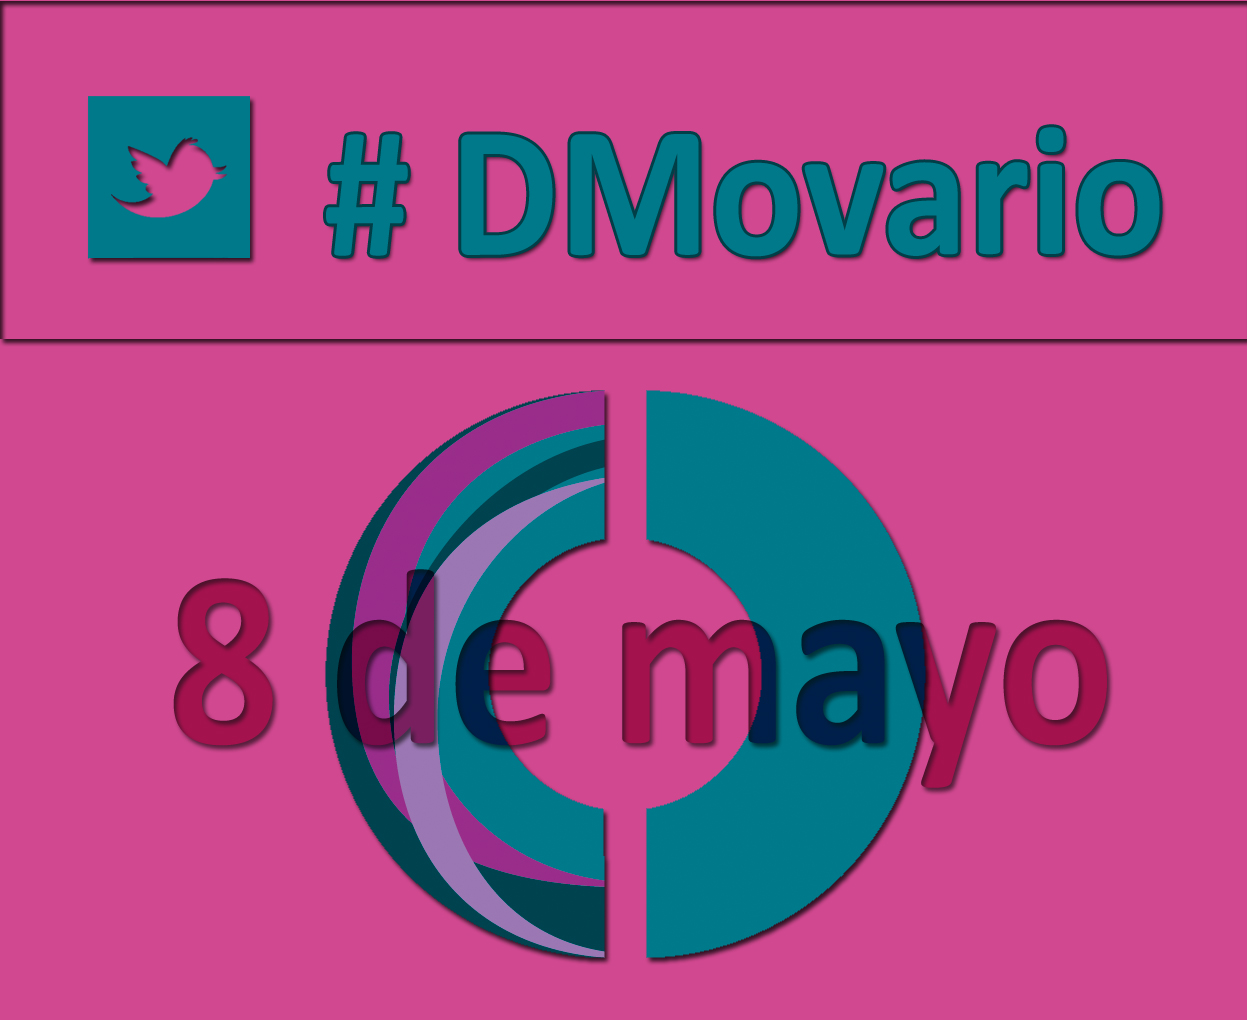 Hashtag DMovario